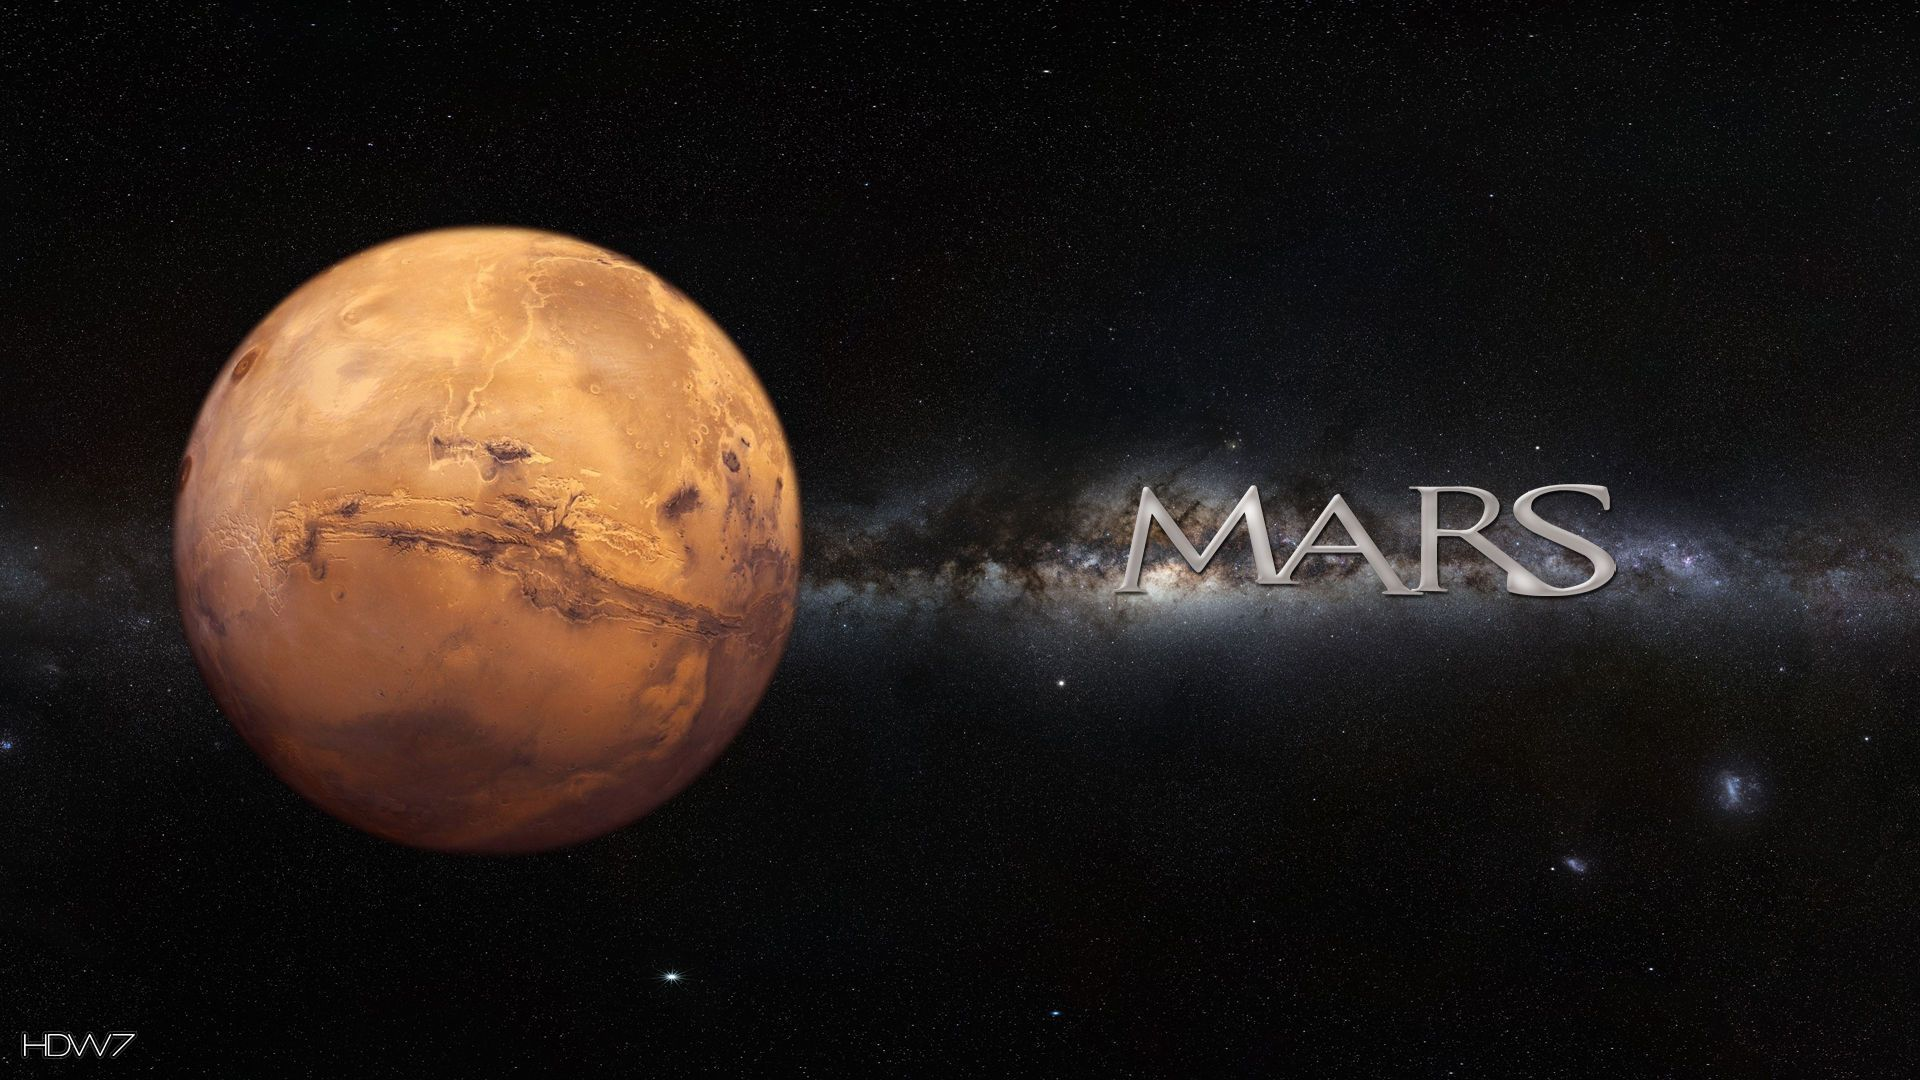 Mars HD Wallpapers, Desktop Backgrounds, Mobile